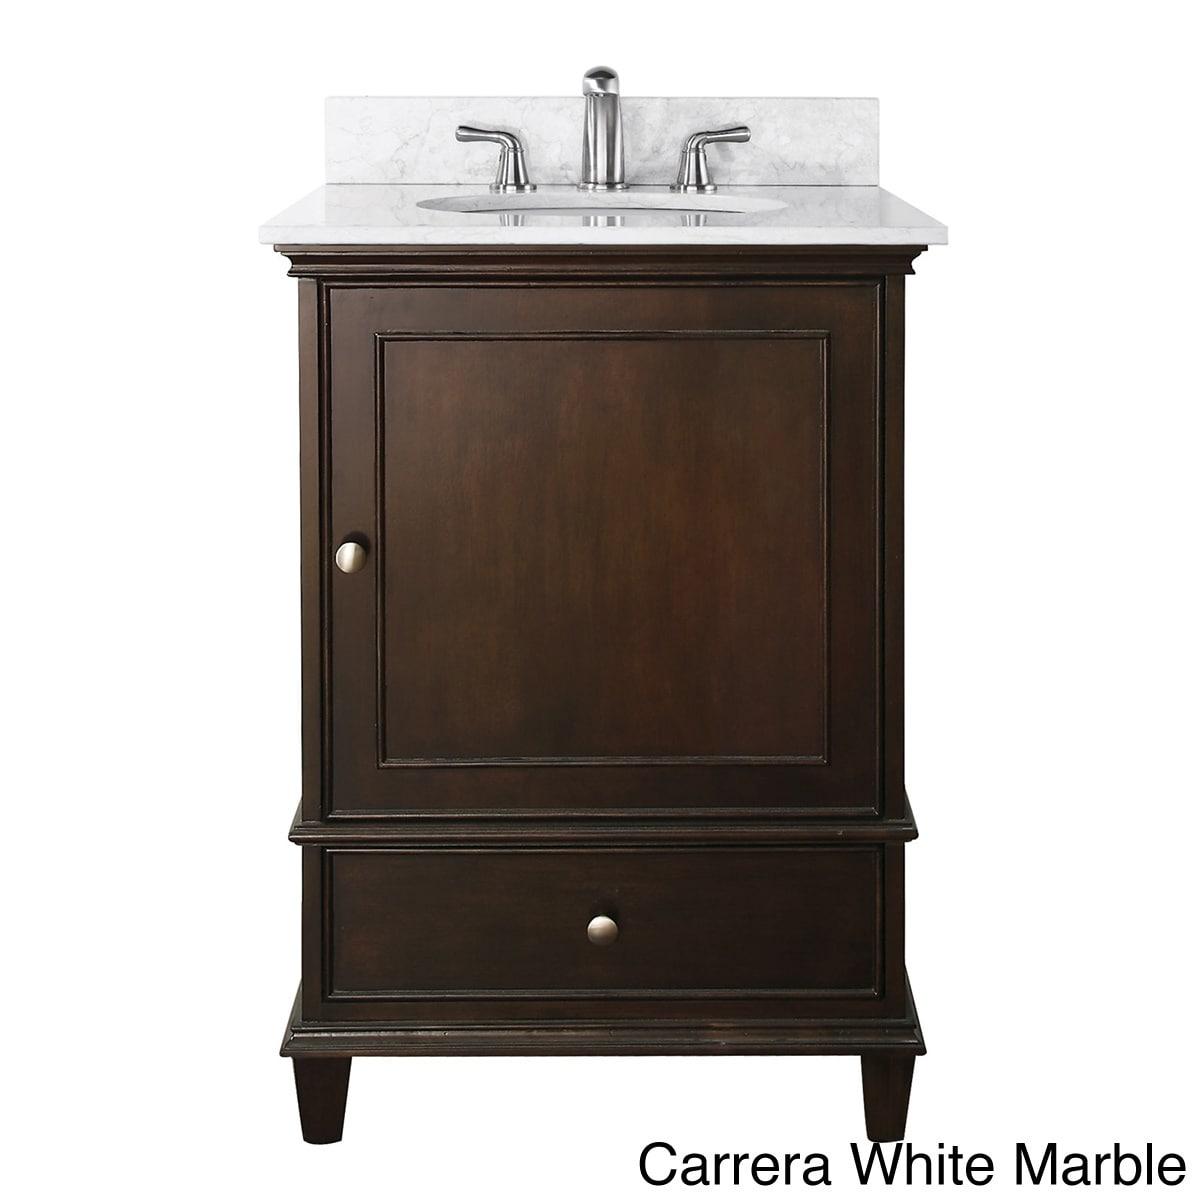 Avanity Windsor 24-inch Single Vanity In Walnut Finish With Sink